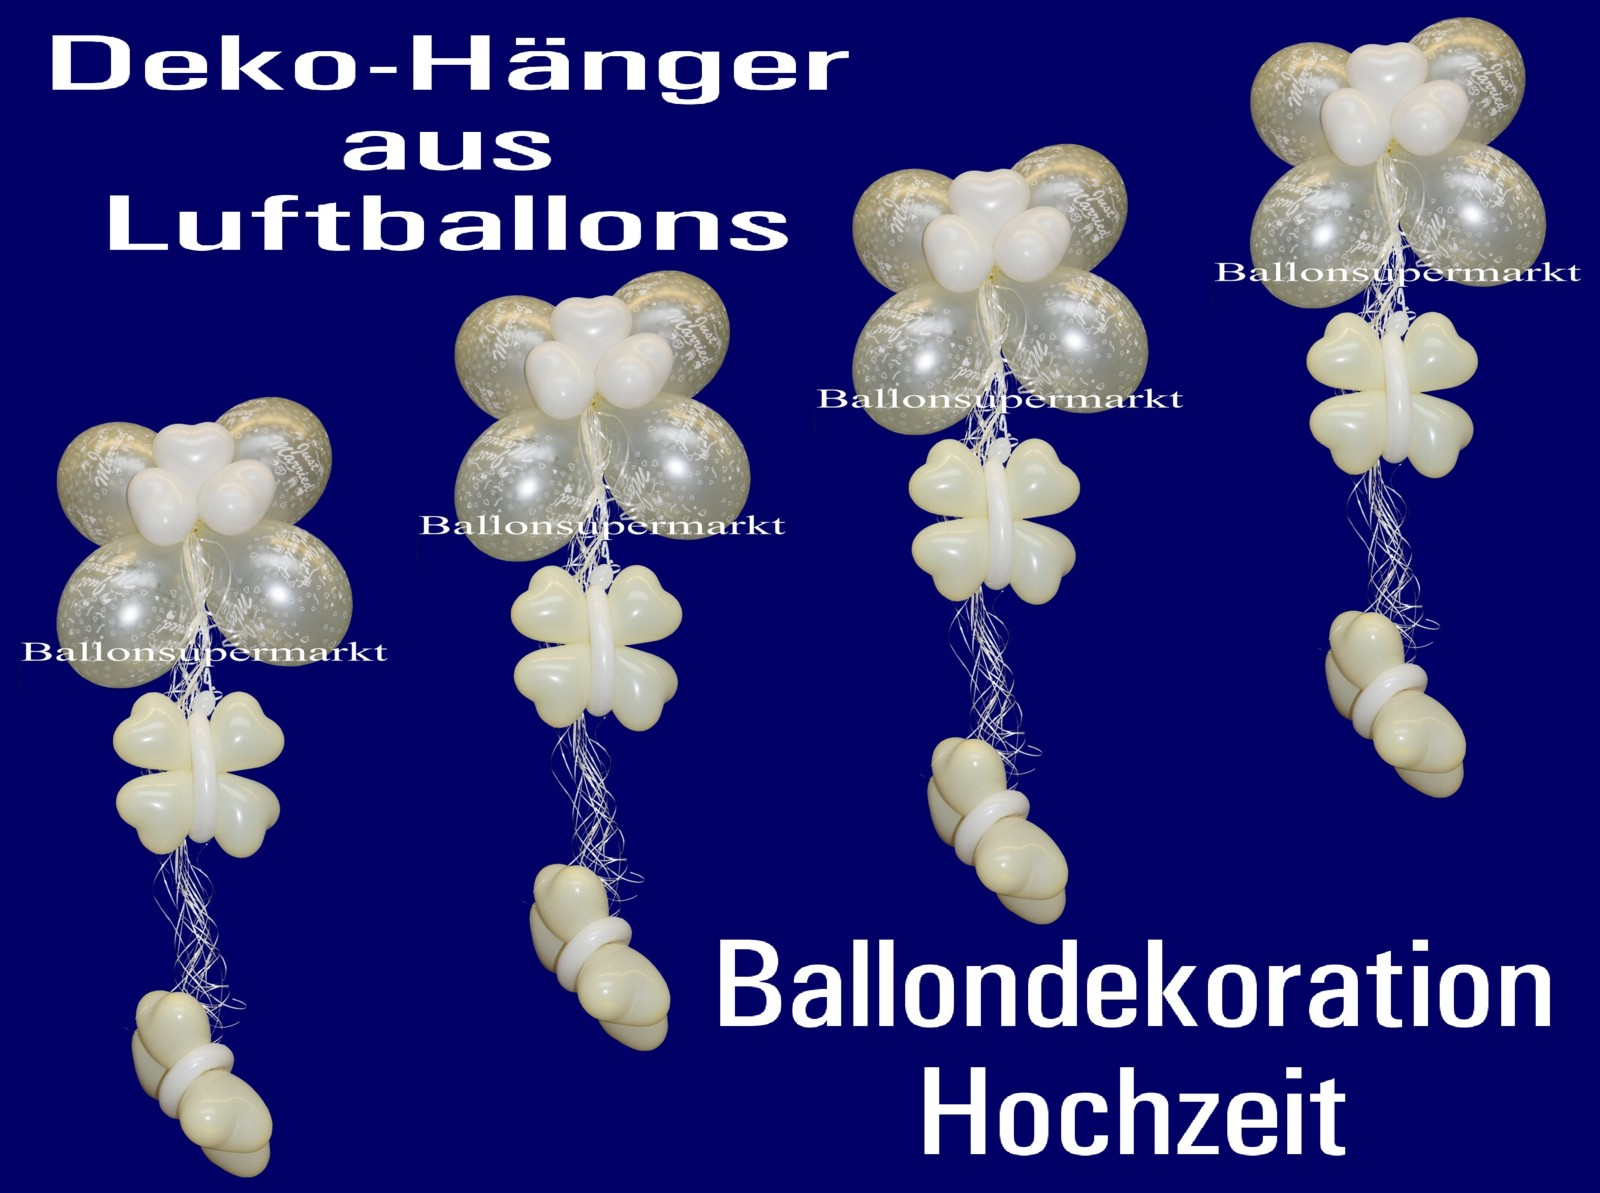 ballondekoration deko h nger aus luftballons just married silber 4 st ck lu hs ballondeko. Black Bedroom Furniture Sets. Home Design Ideas